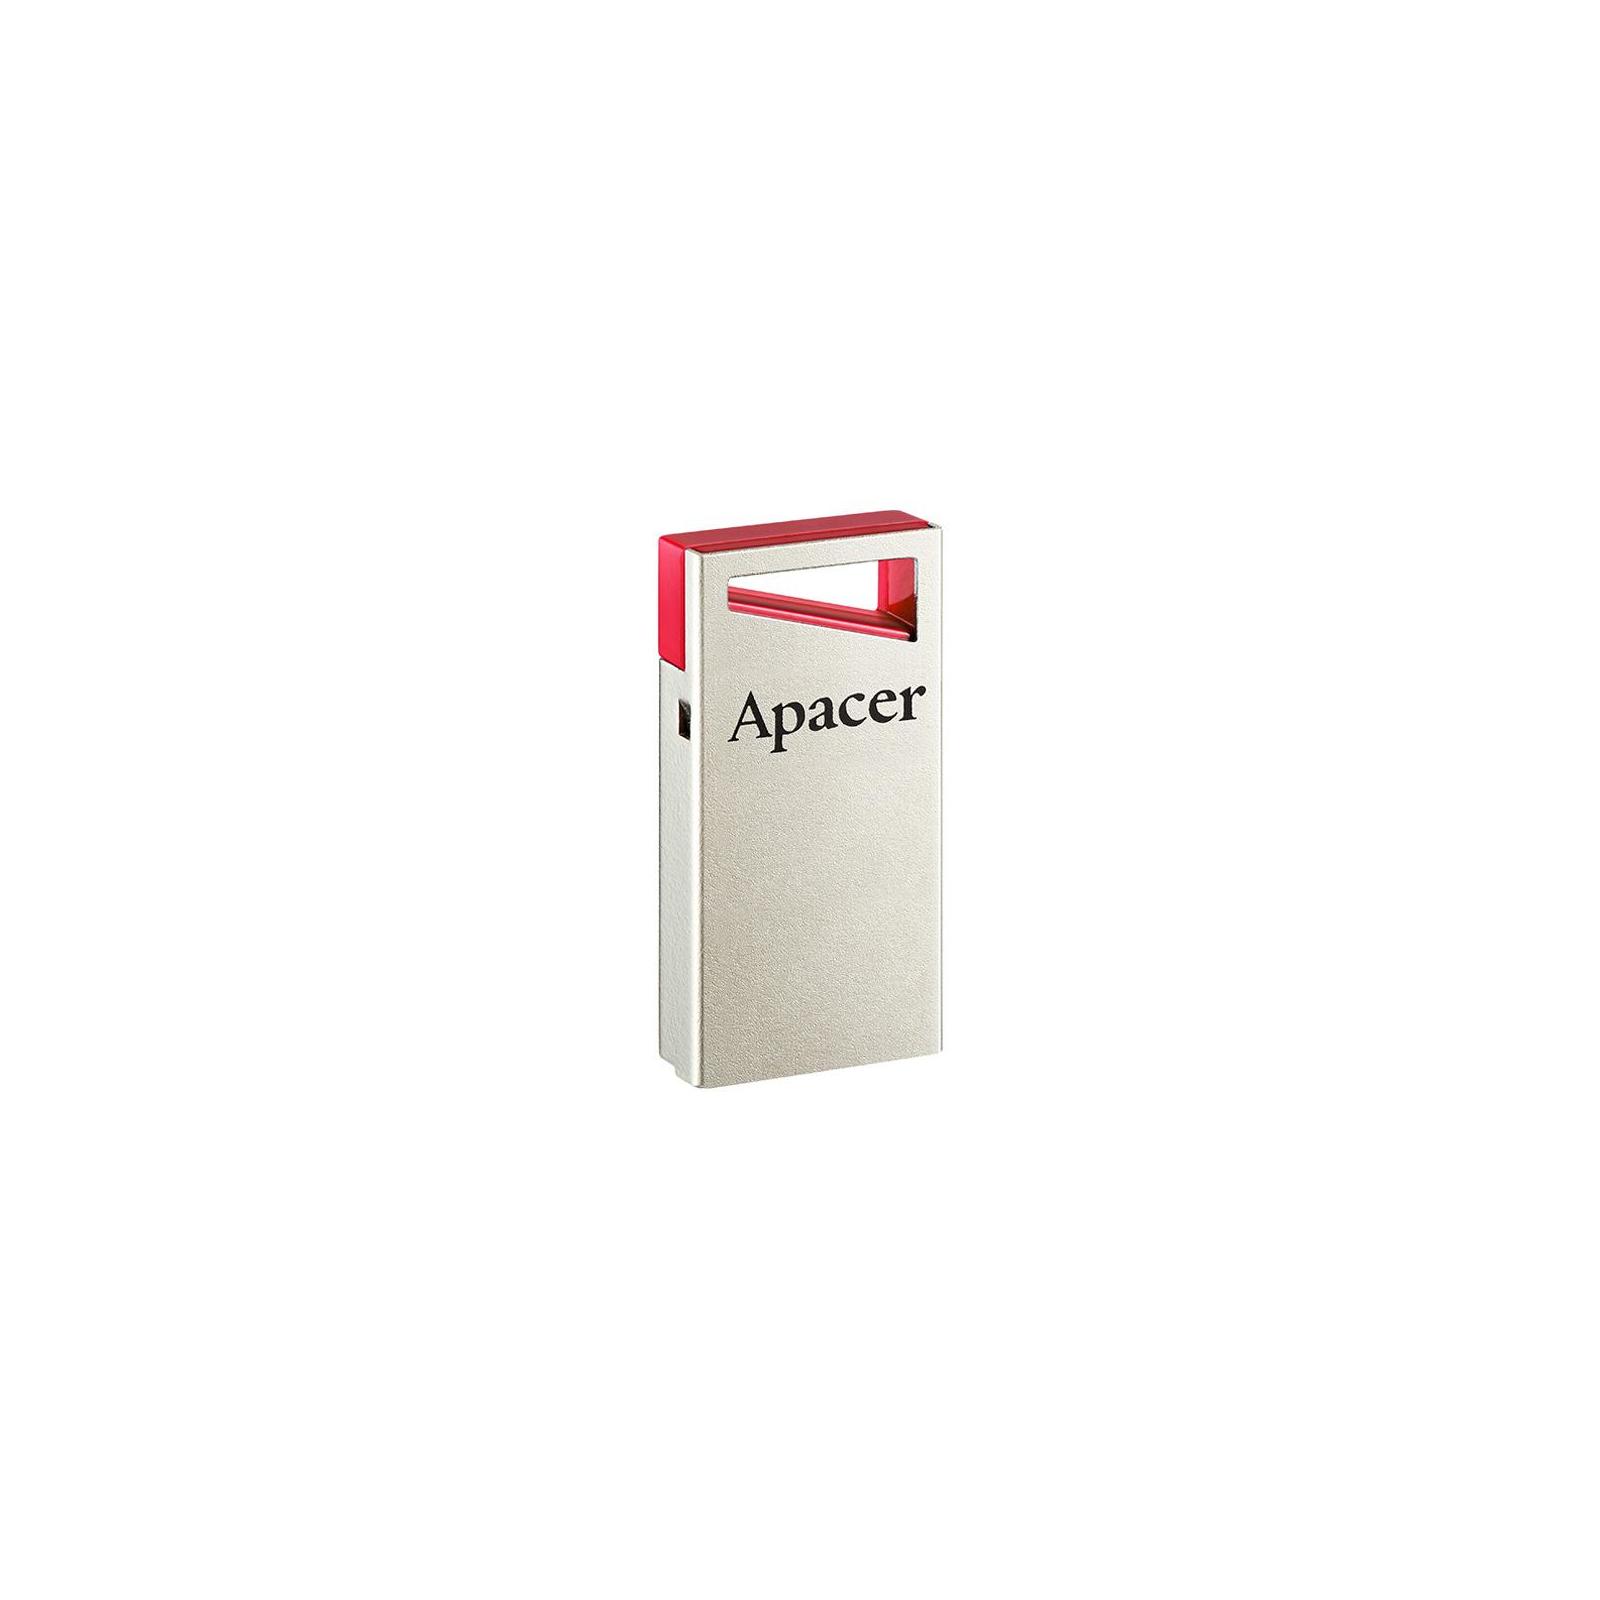 USB флеш накопитель Apacer 64GB AH112 Red USB 2.0 (AP64GAH112R-1) изображение 3